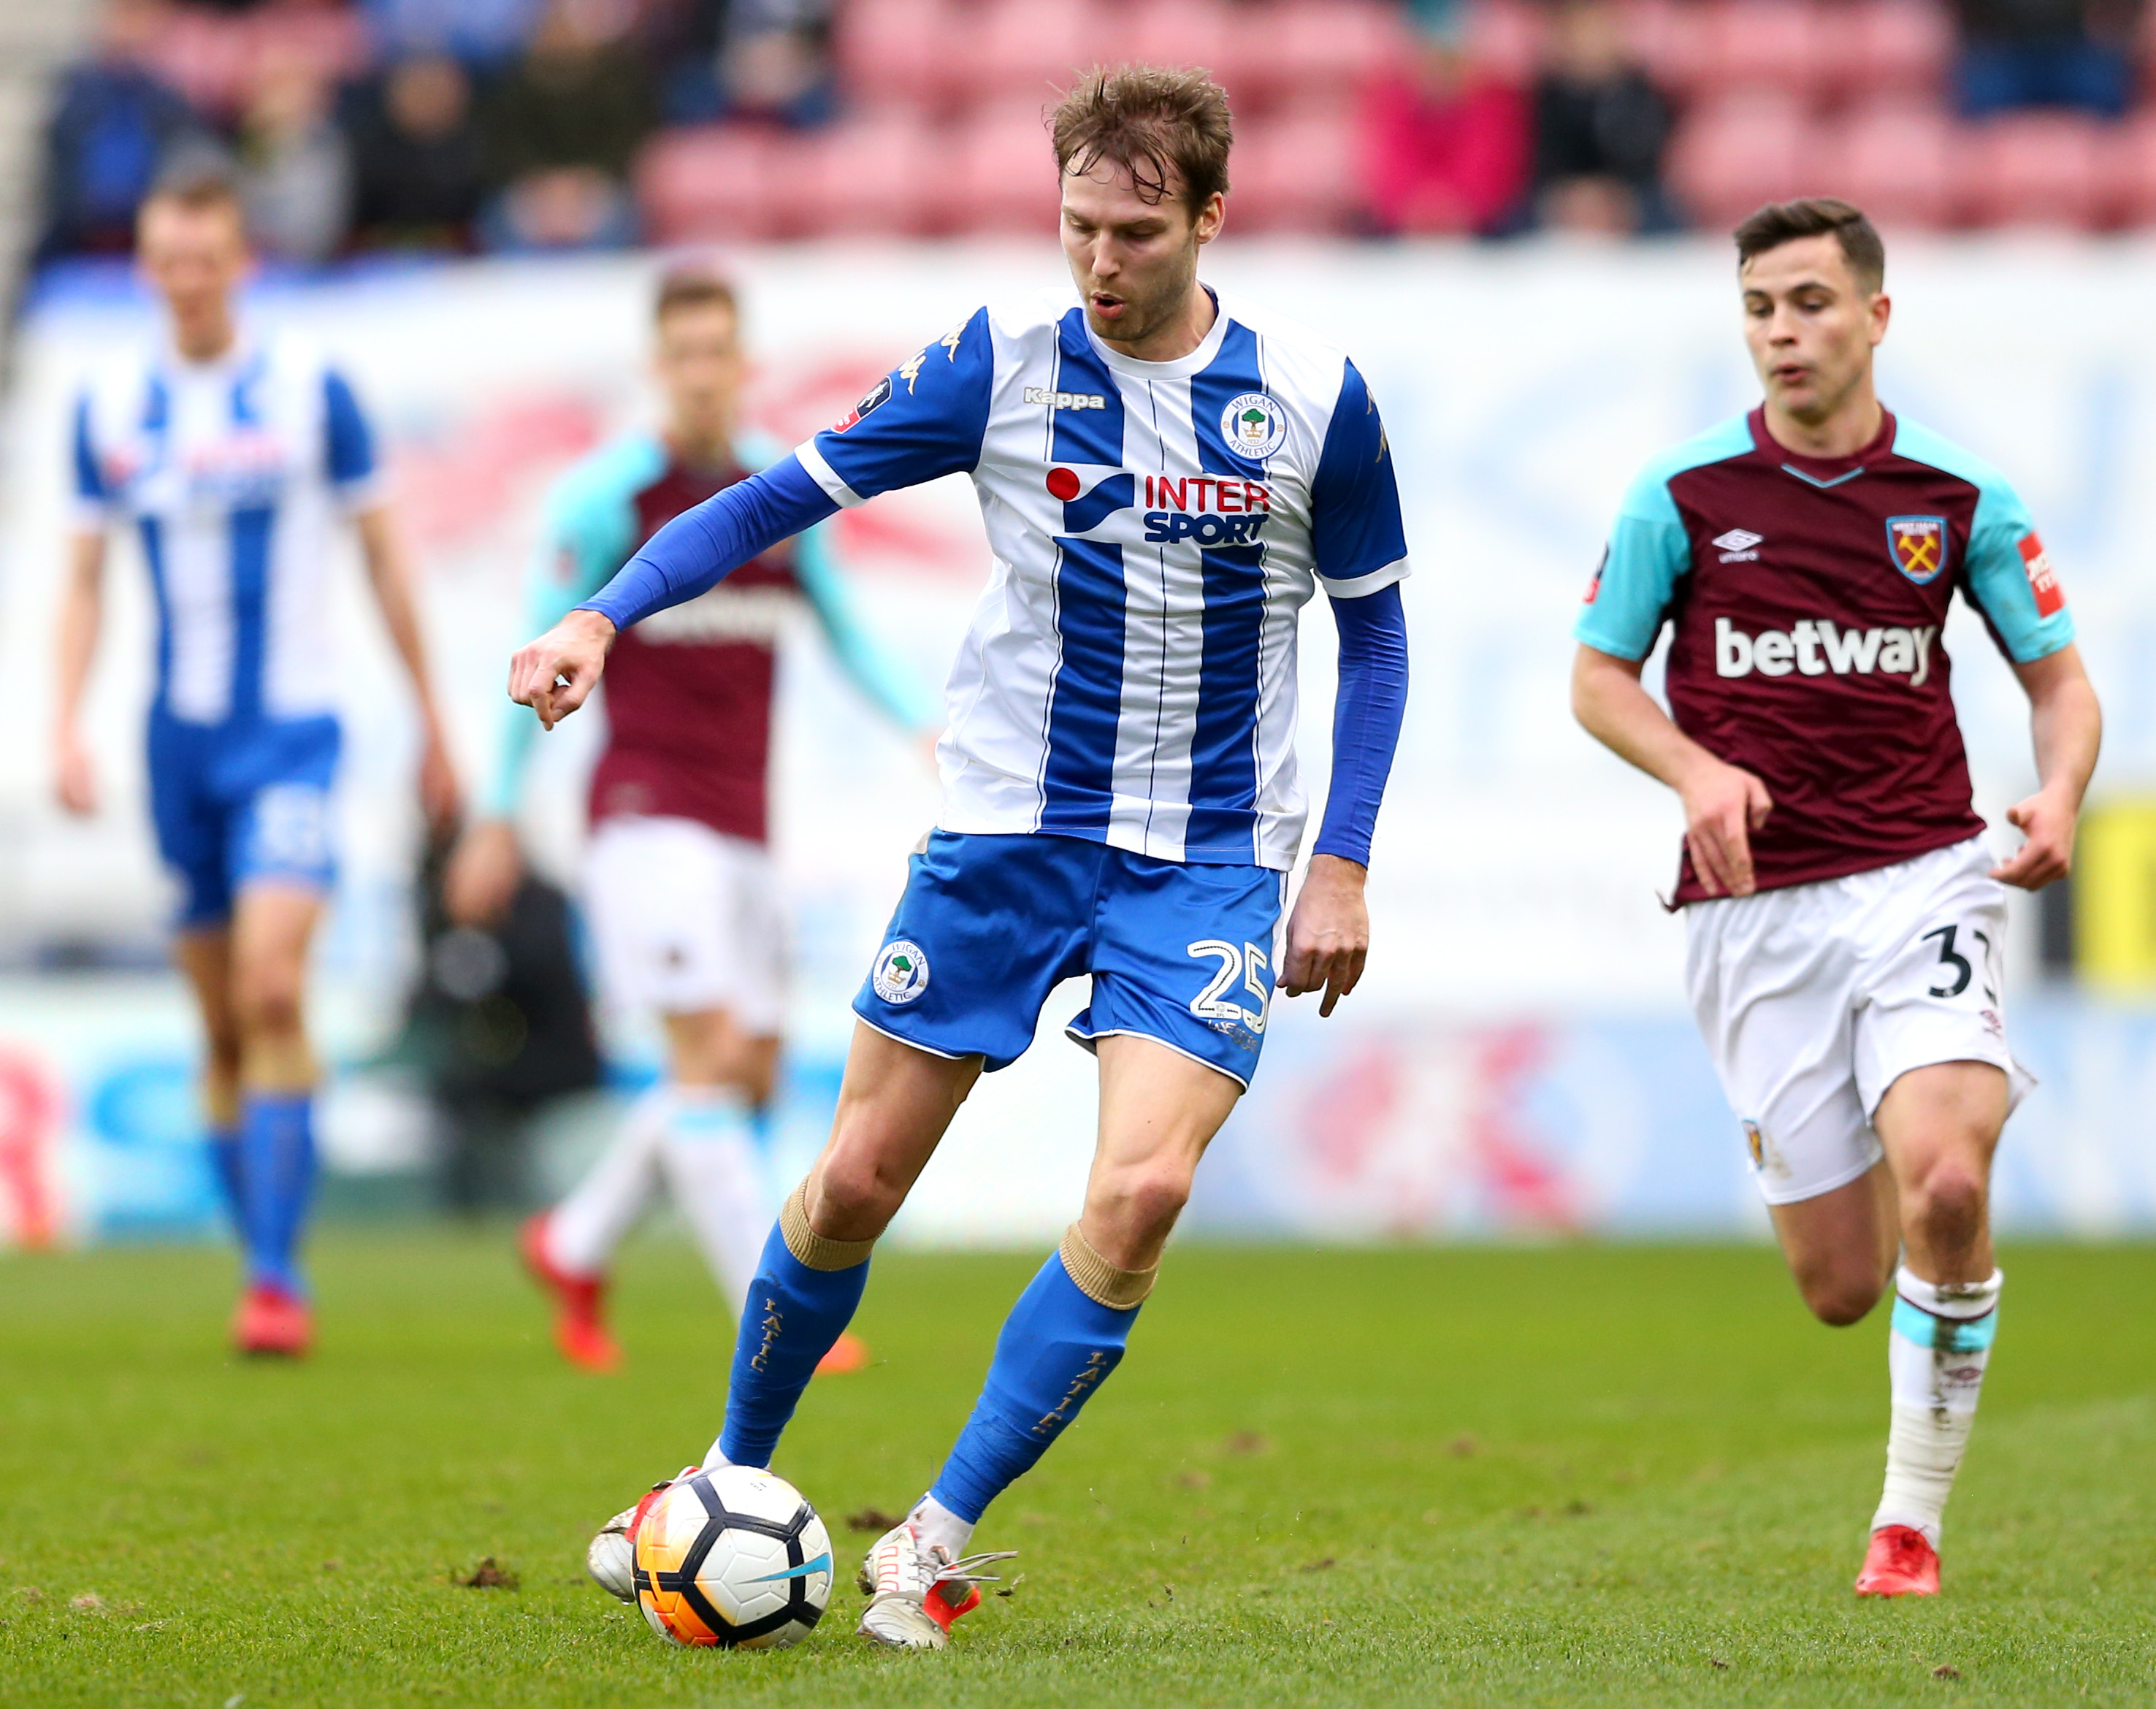 Wigan Athletic v West Ham United - The Emirates FA Cup Fourth Round